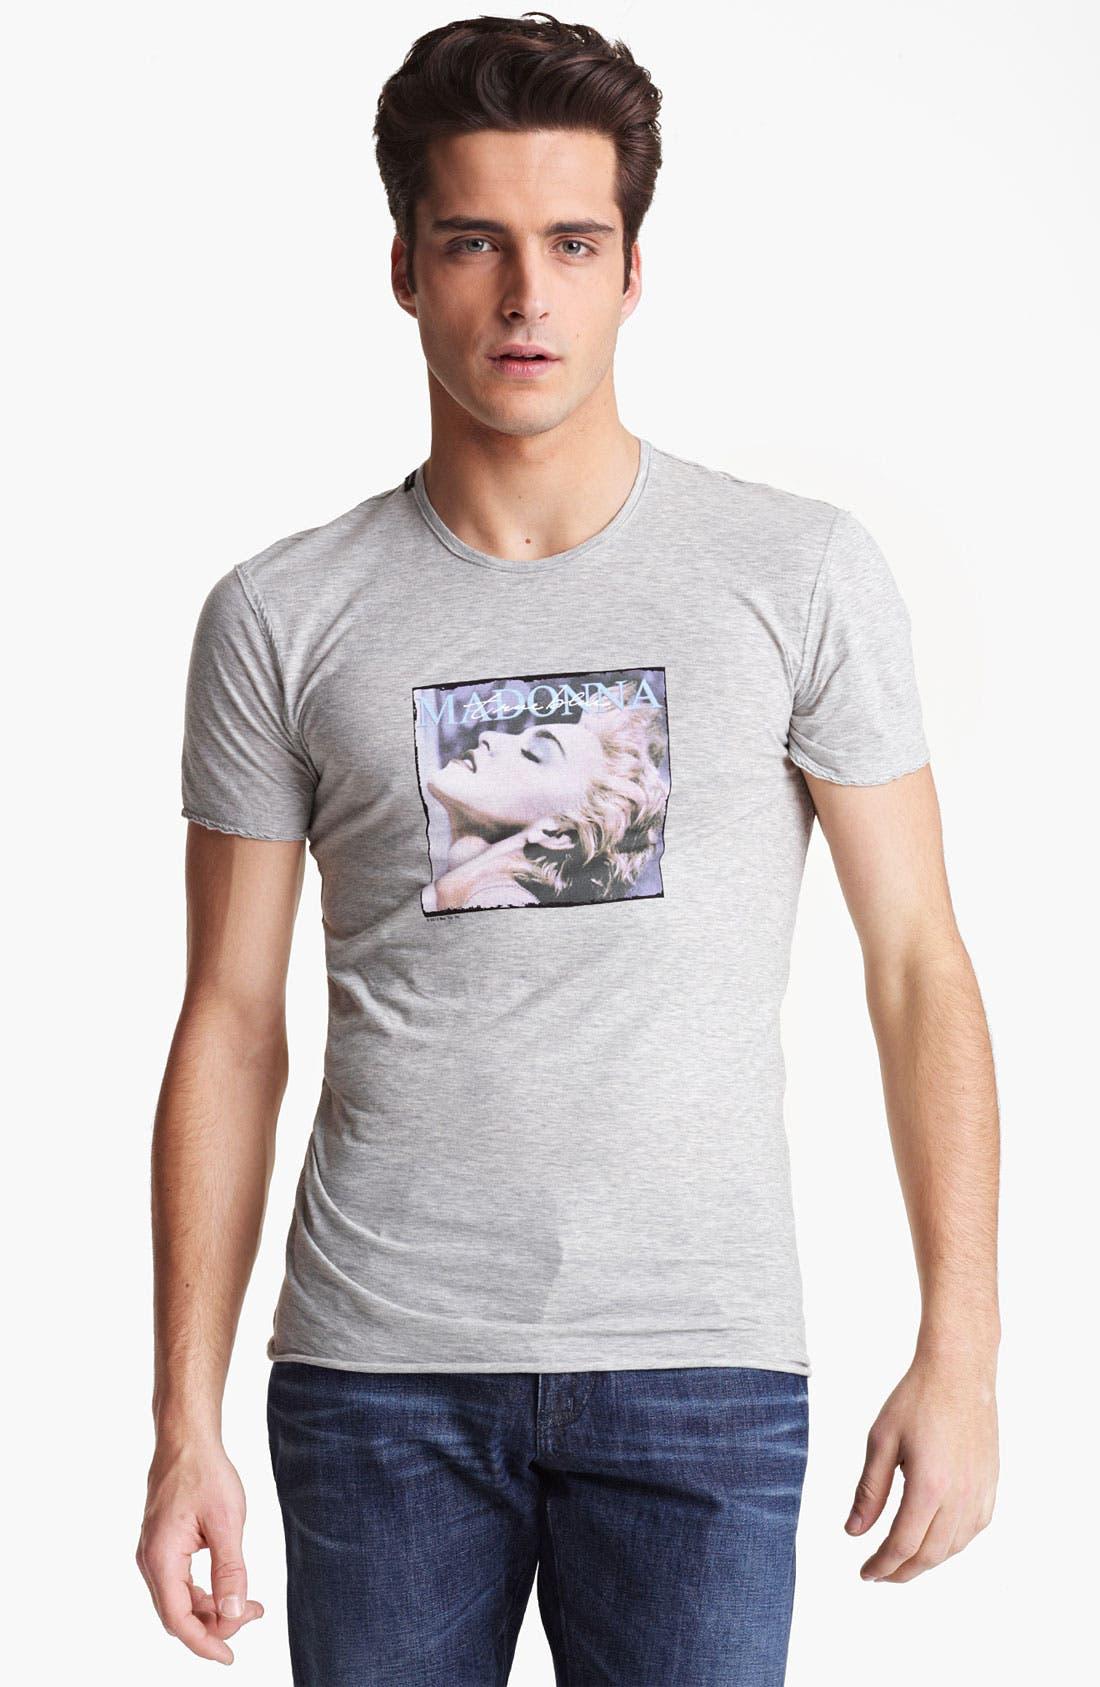 Main Image - Dolce&Gabbana 'Madonna - True Blue' Graphic T-Shirt